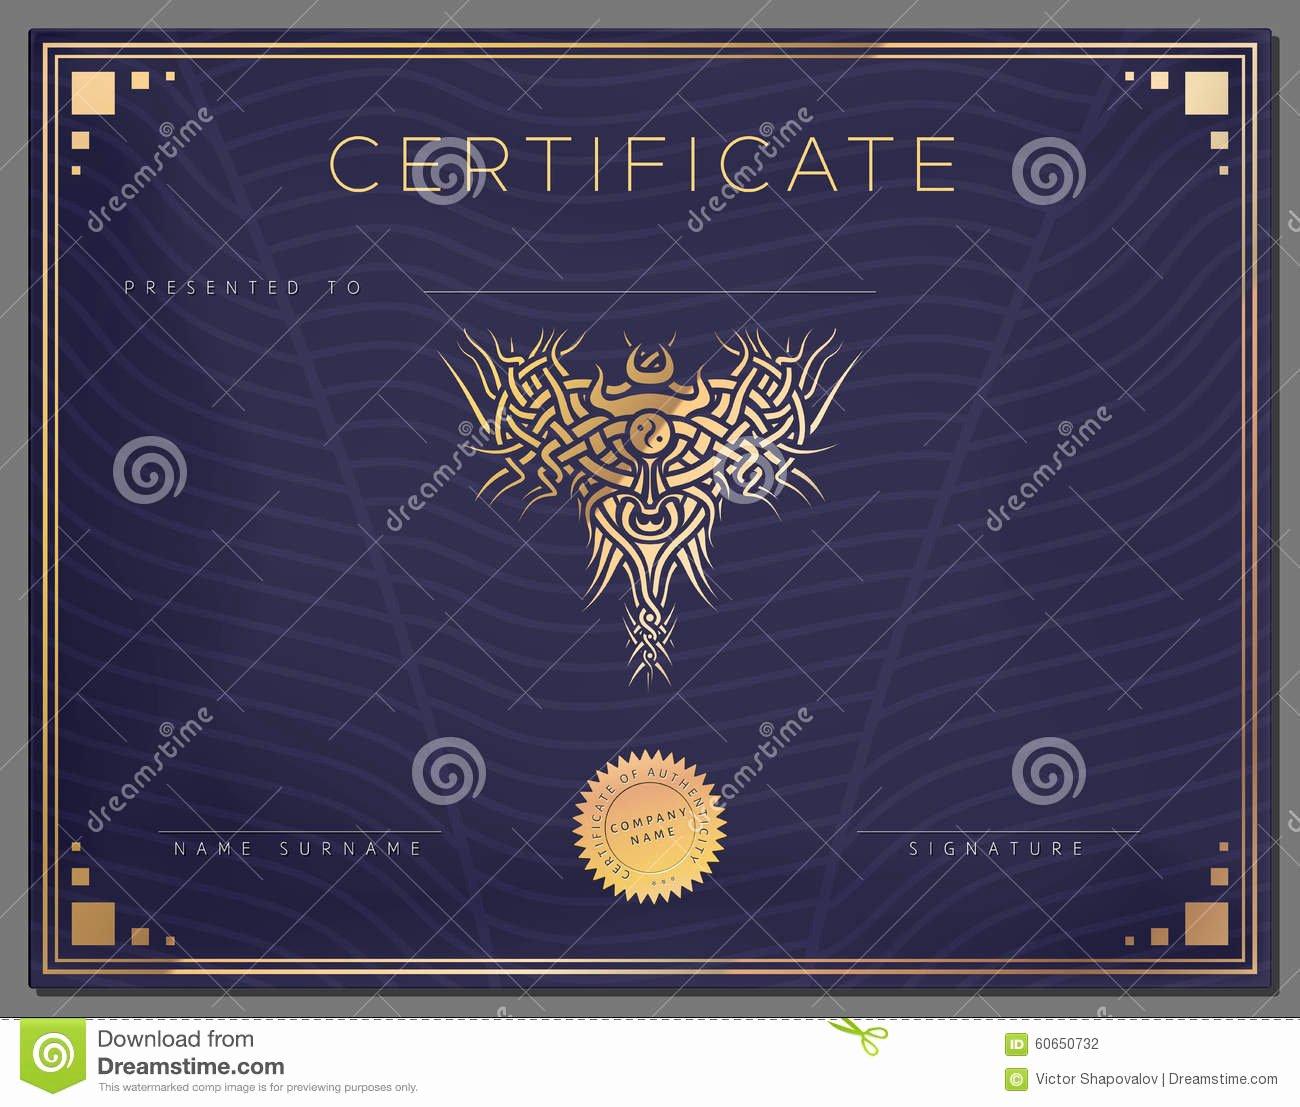 Gold Border Certificate Paper Unique Gift Vintage Certificate Diploma Award Border Template